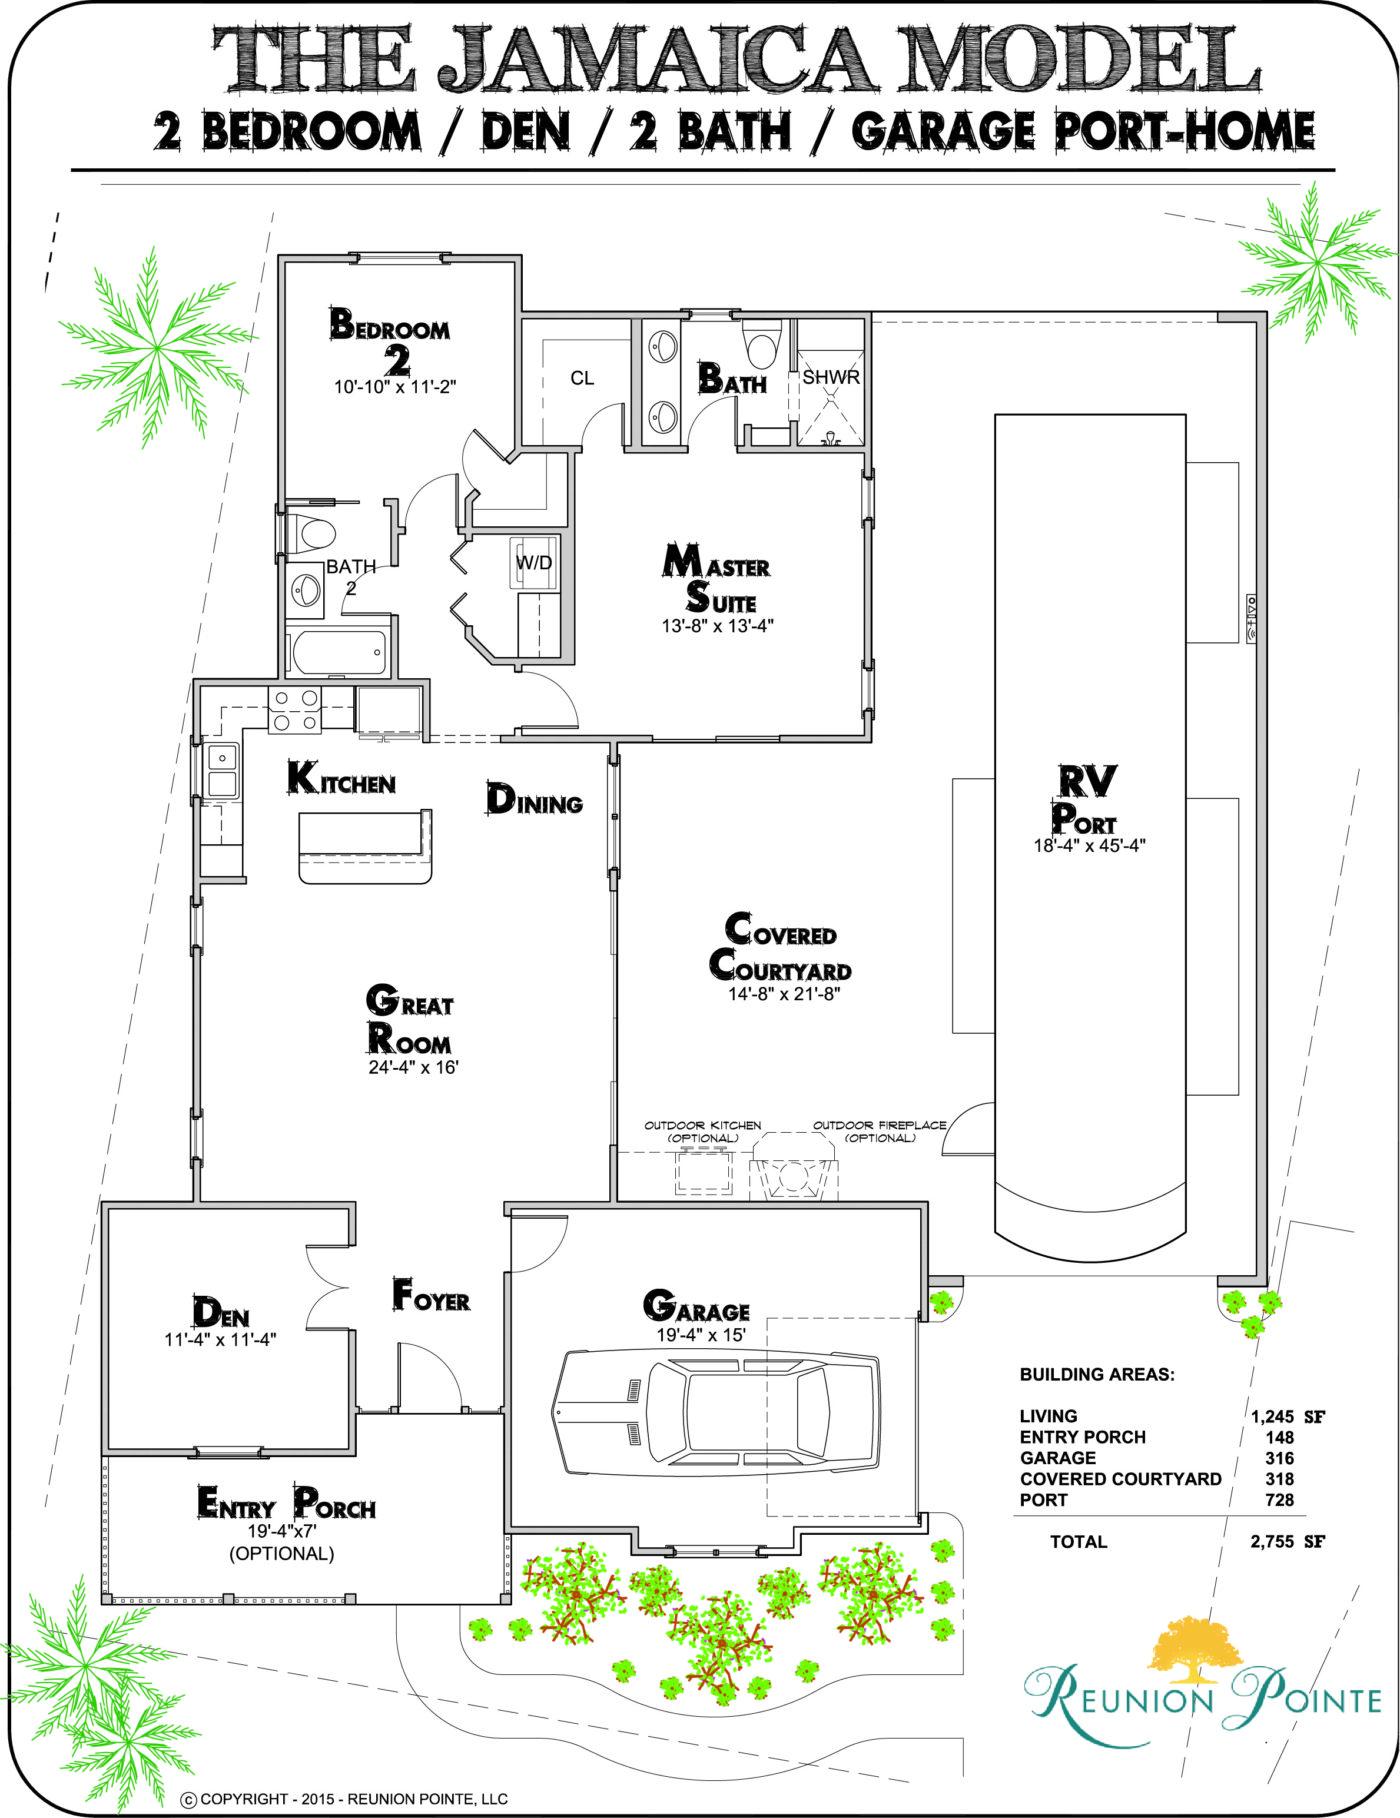 Jamaica RV Port-Home Model Floorplan